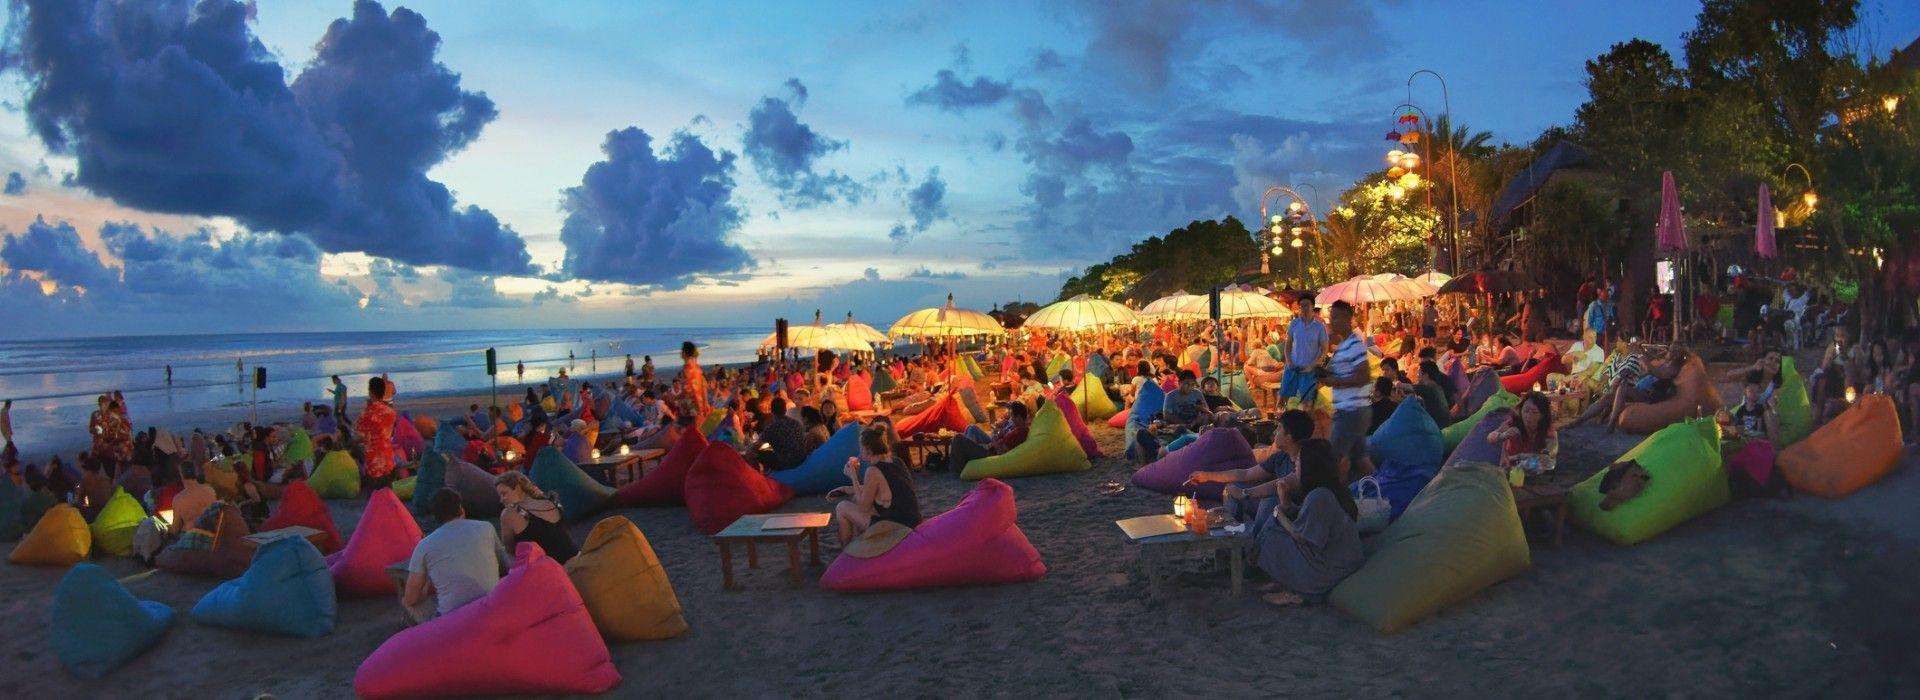 Tourists enjoy the sunset at the beaches of Seminyak